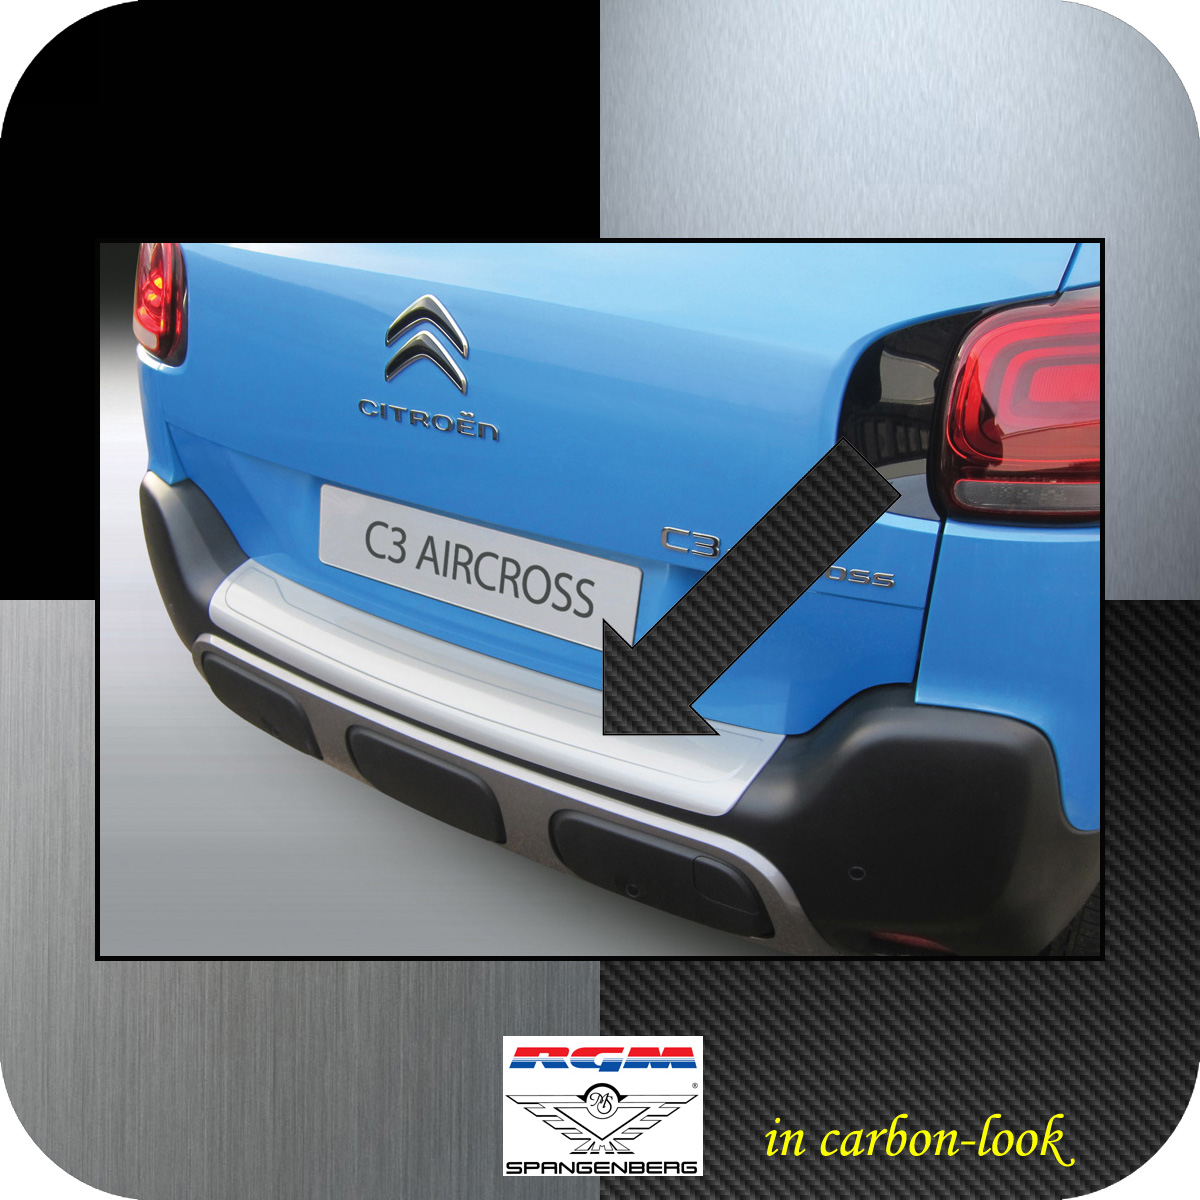 Ladekantenschutz Carbon-Look Citroen C3 Aircross ab Baujahr 11.2017- 3509629